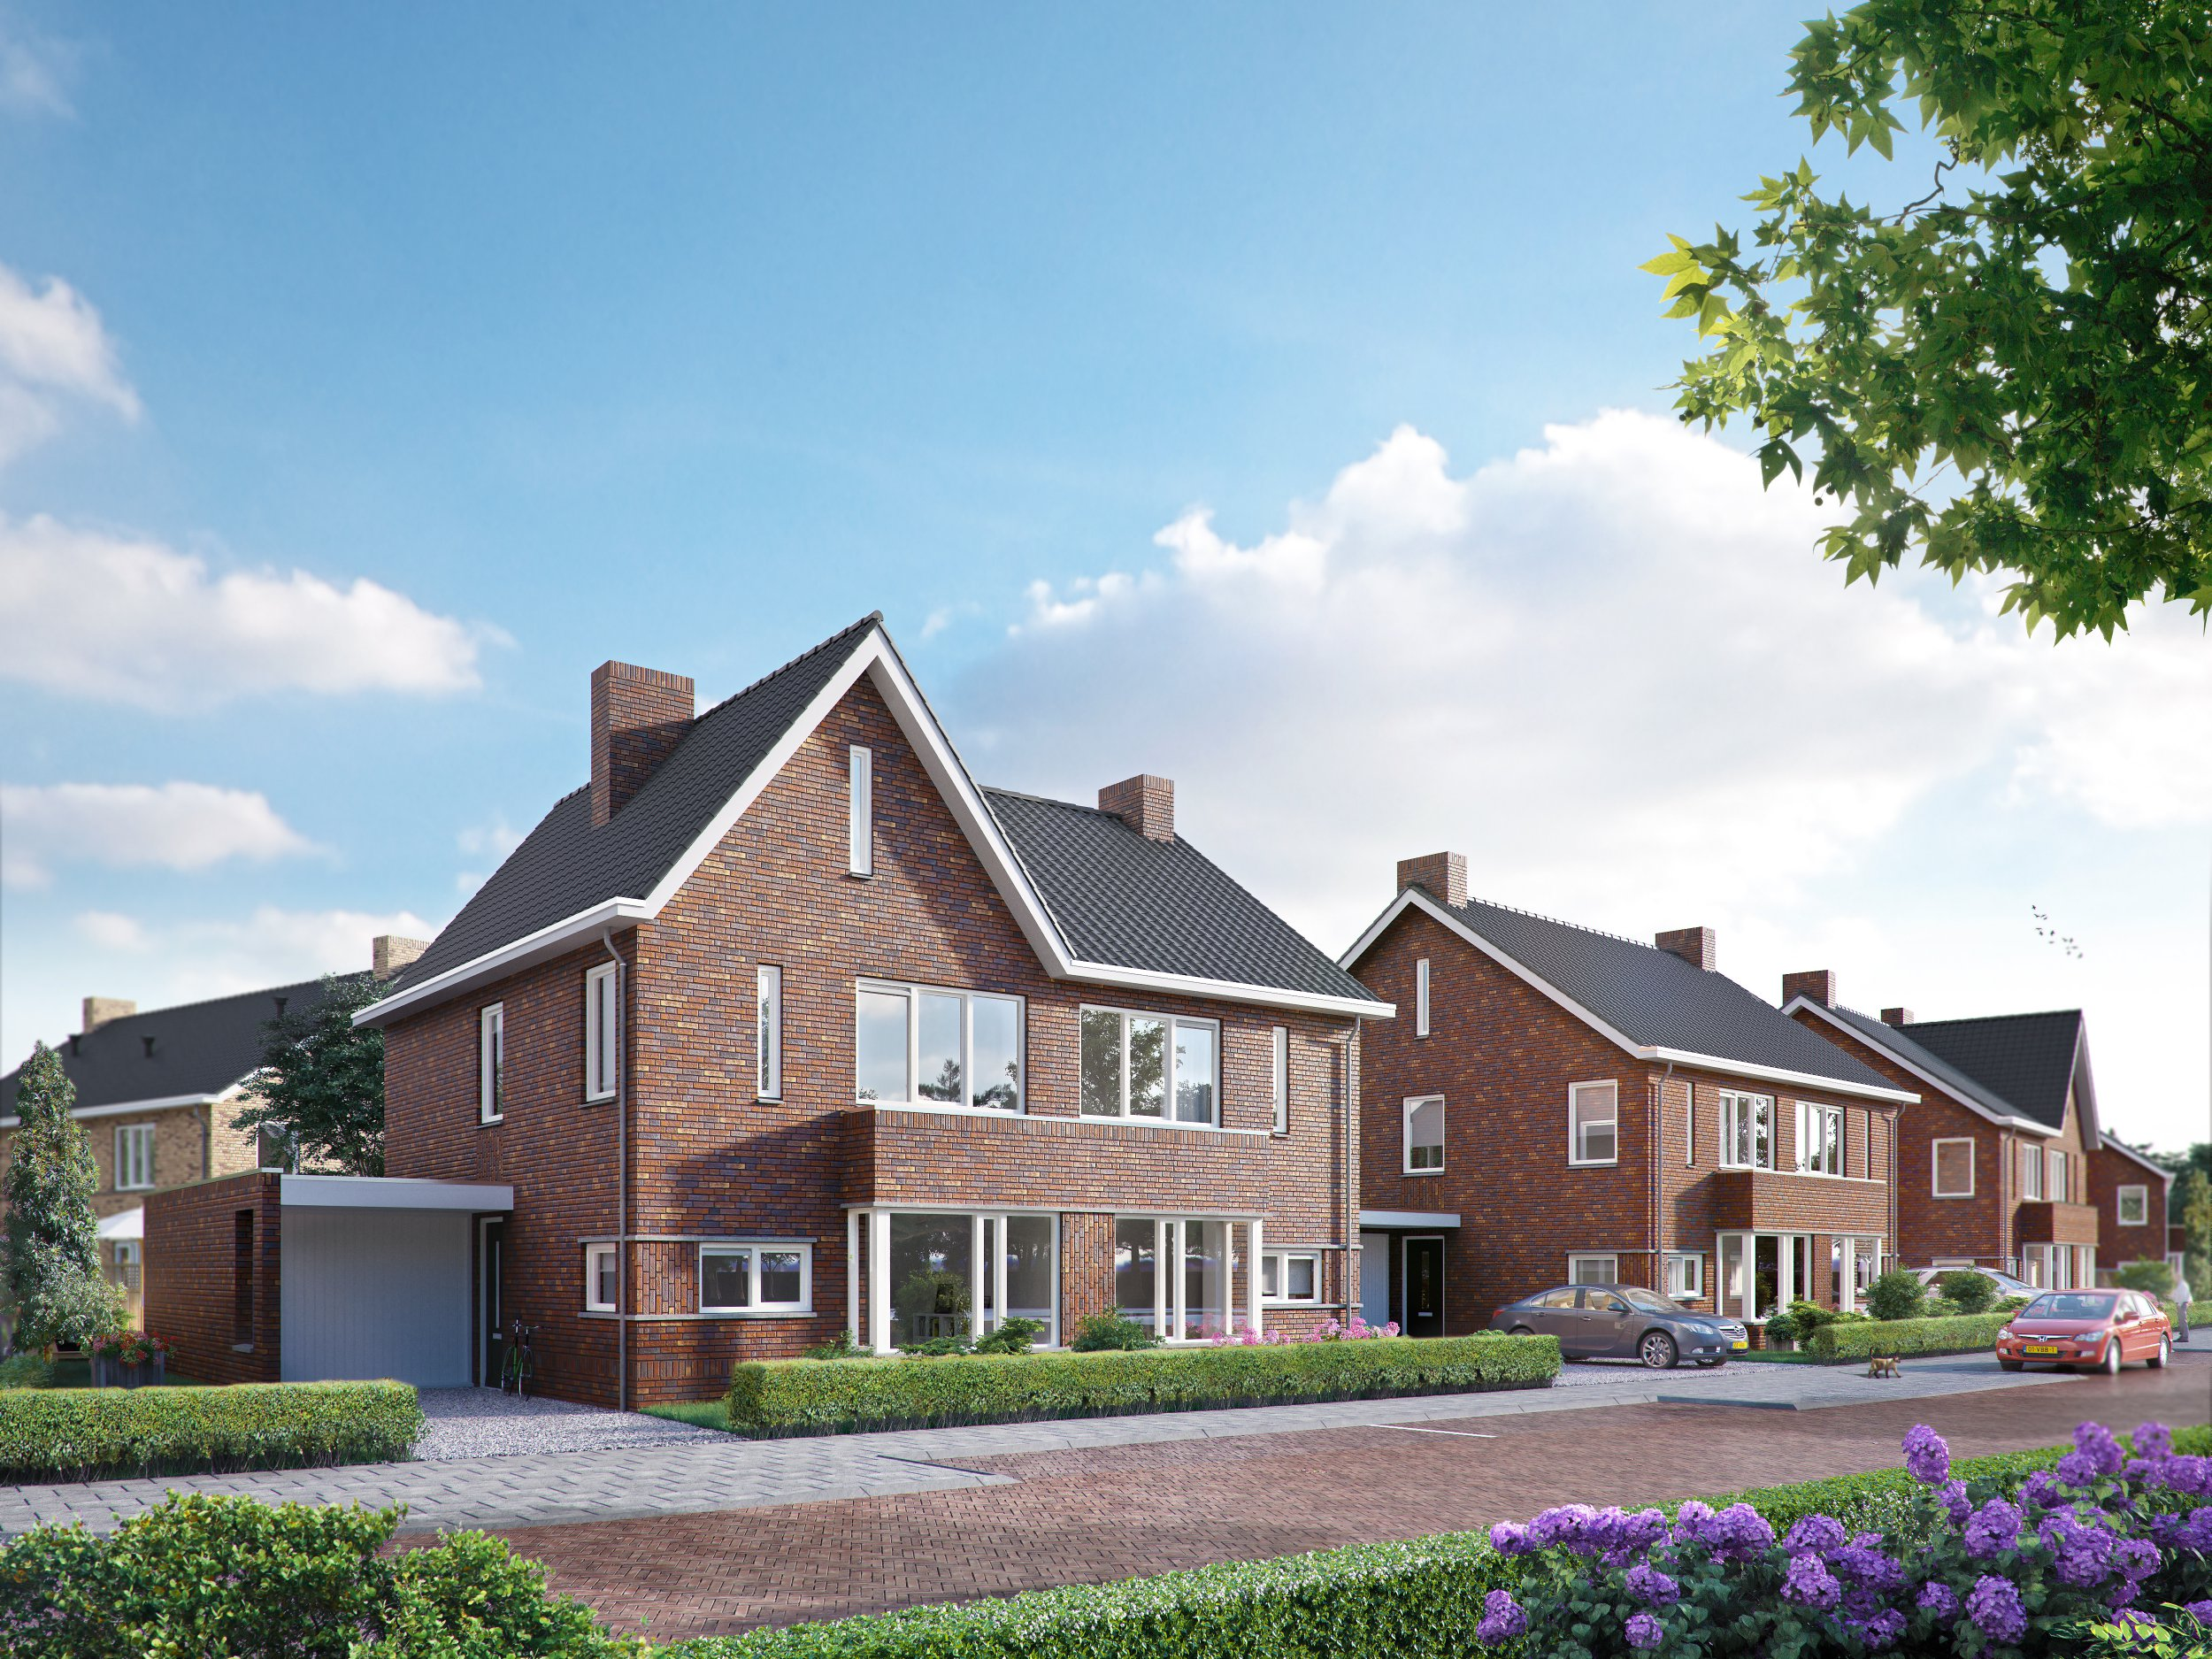 Start verkoop woningen De Grote Boel, Oosterhout - Nijmegen